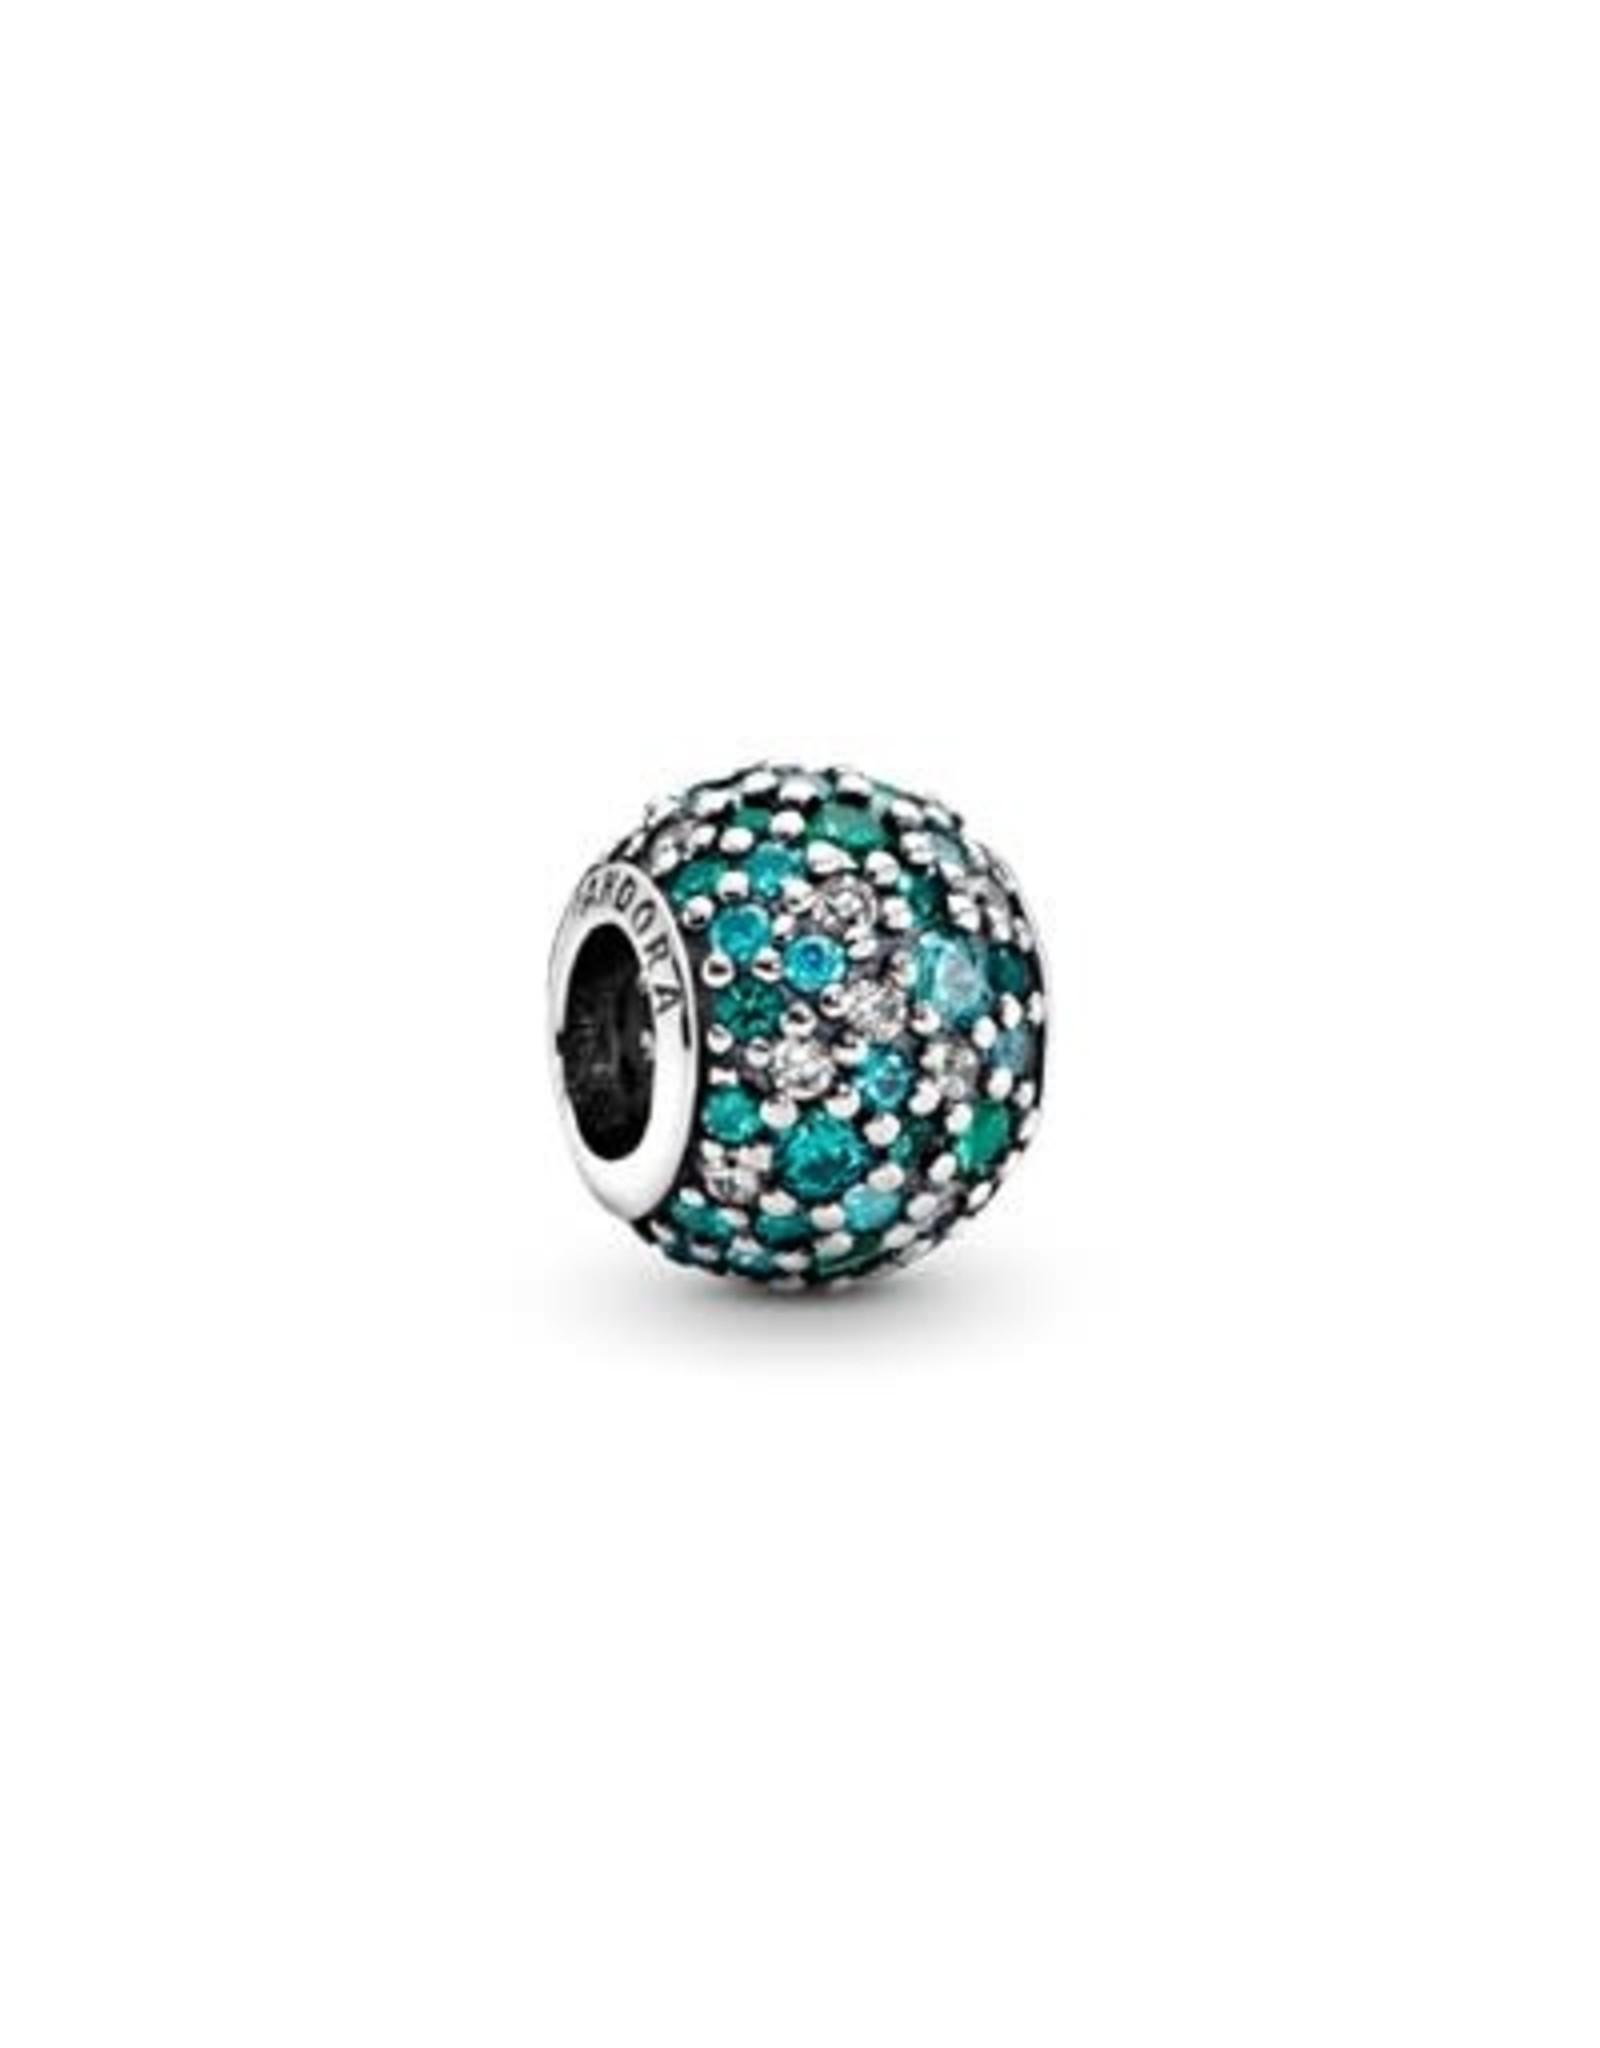 Pandora Pandora Charm,Ocean Mosaic Pave, Mixed Green CZ & Green Crystal